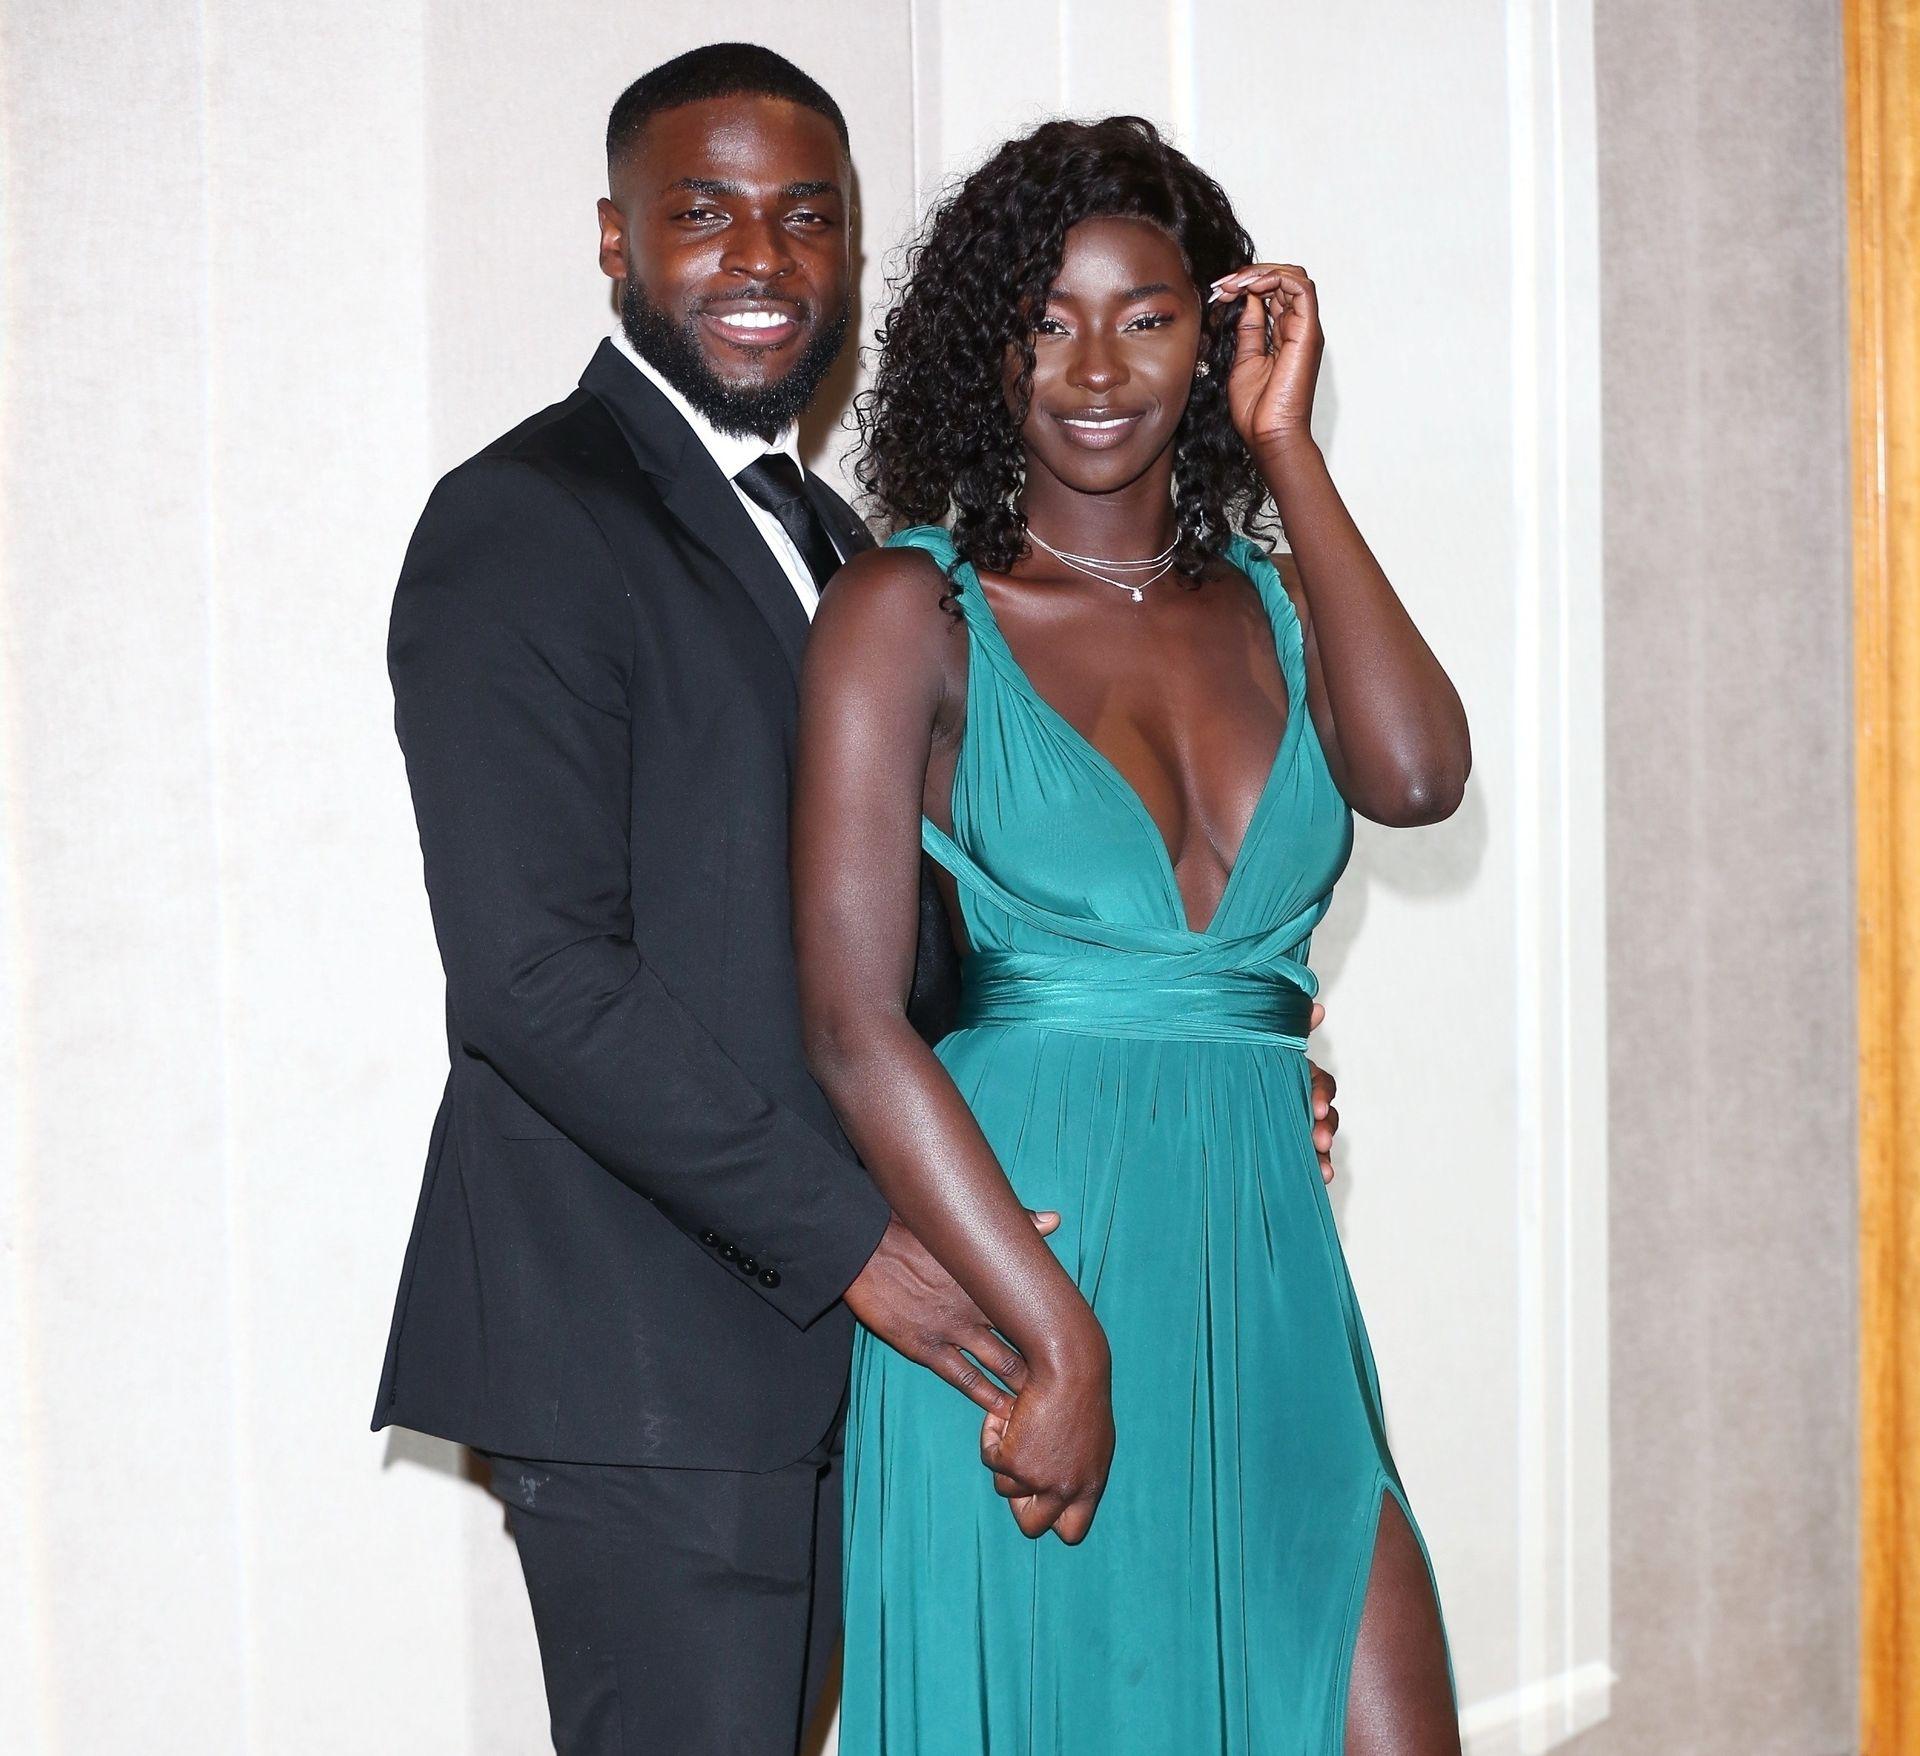 Mike Boateng & Priscilla Anyabu Are Seen At British Ethnic Diversity Sports Awards 0131